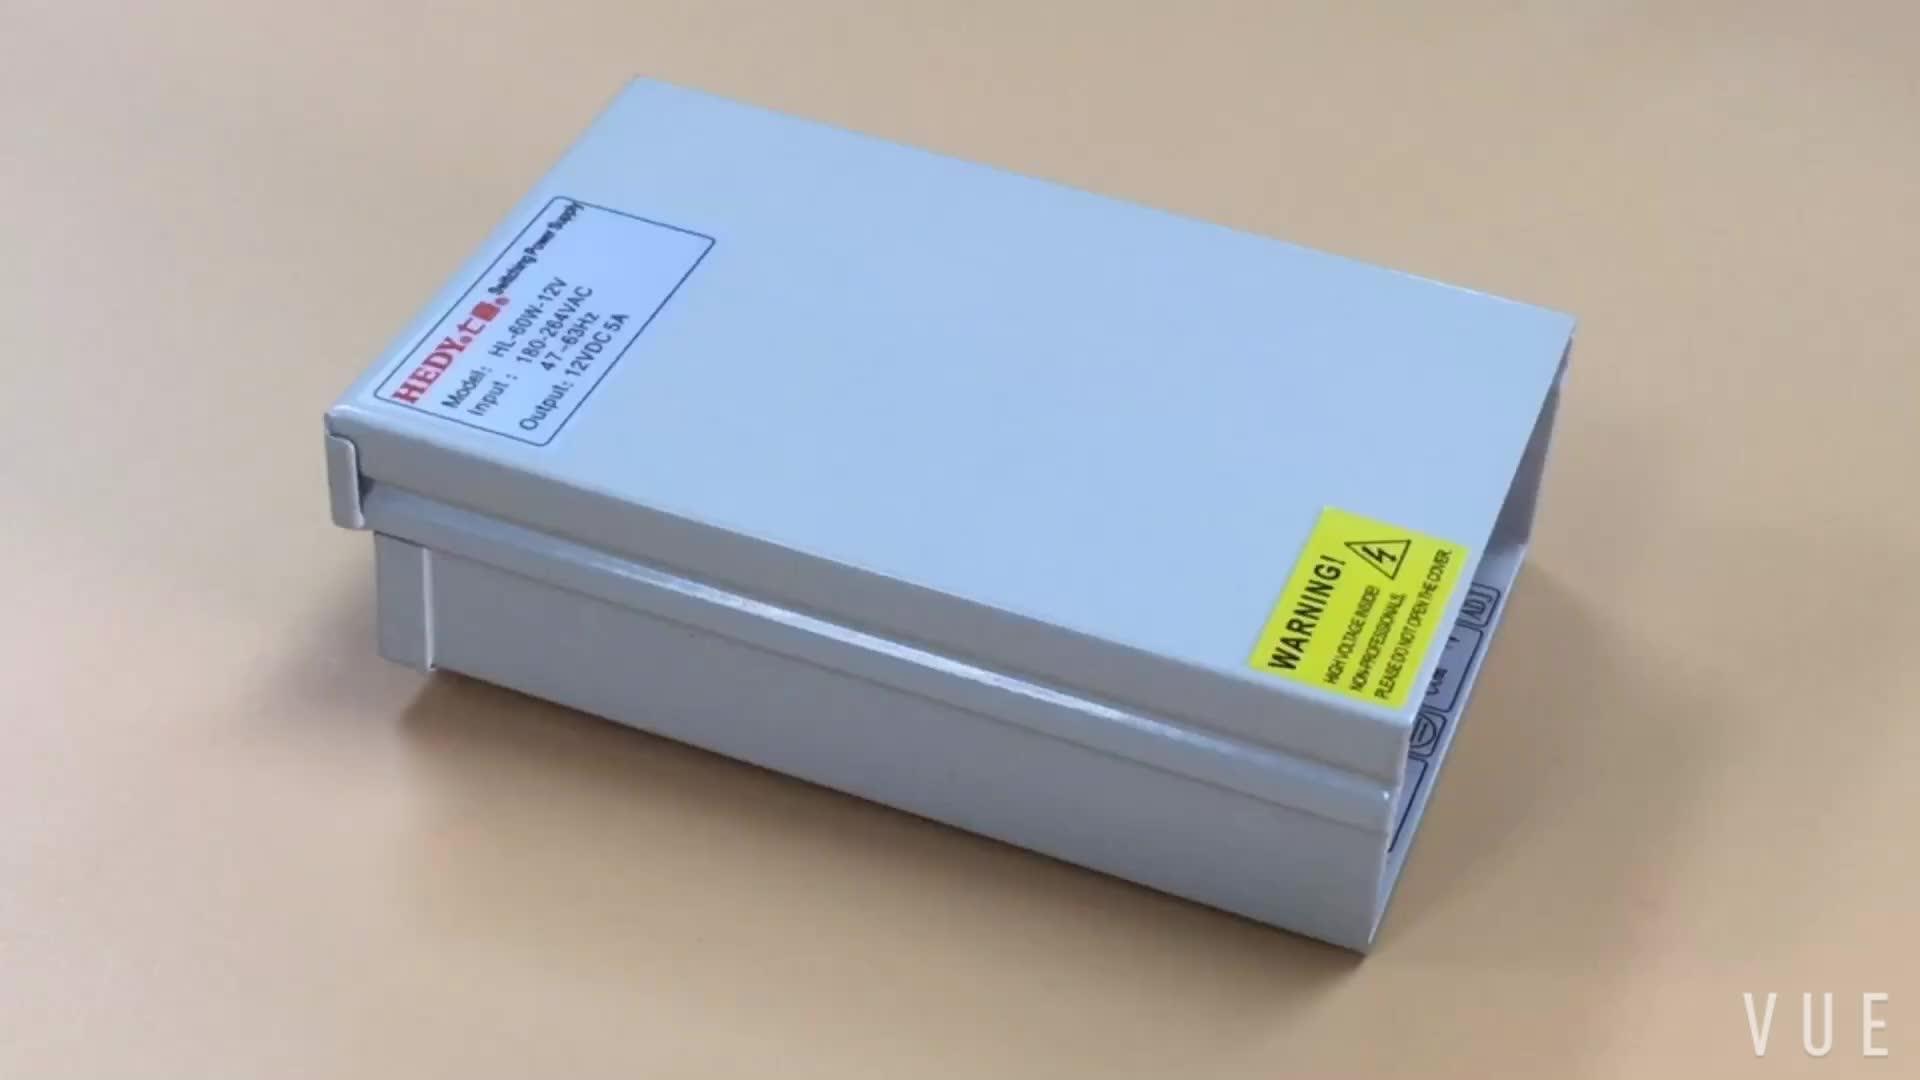 12V 5A 60W switch mode power supply CCTV